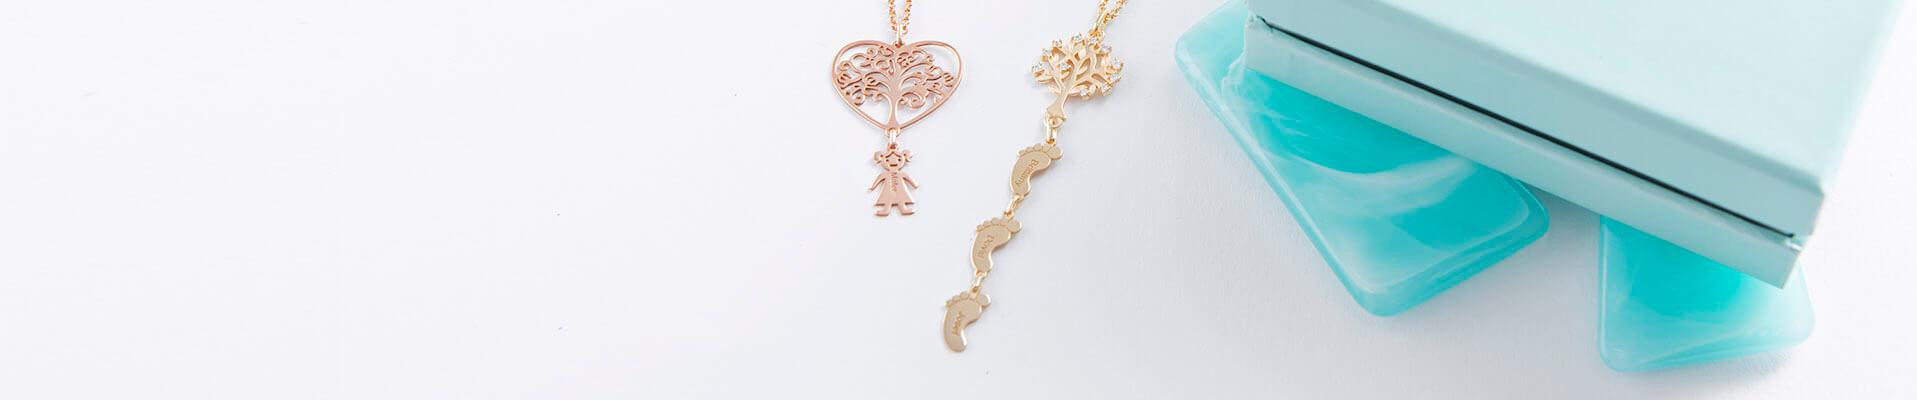 tree of life jewellery web banner